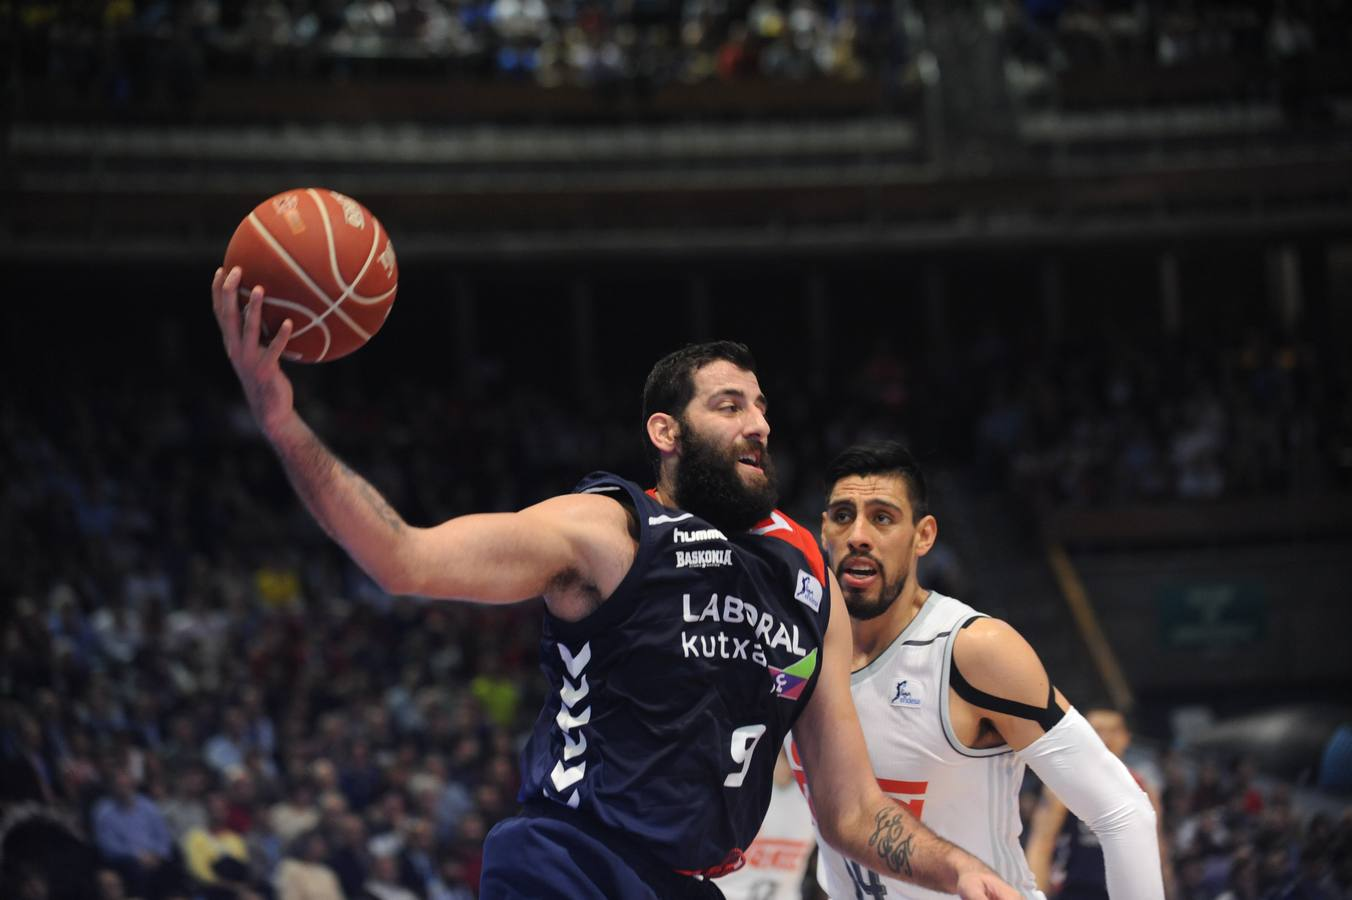 Baskonia laboralkutxa- real madrid Semifinal copa del rey 2016 A coruña 20-2-2016 igor aizpuru